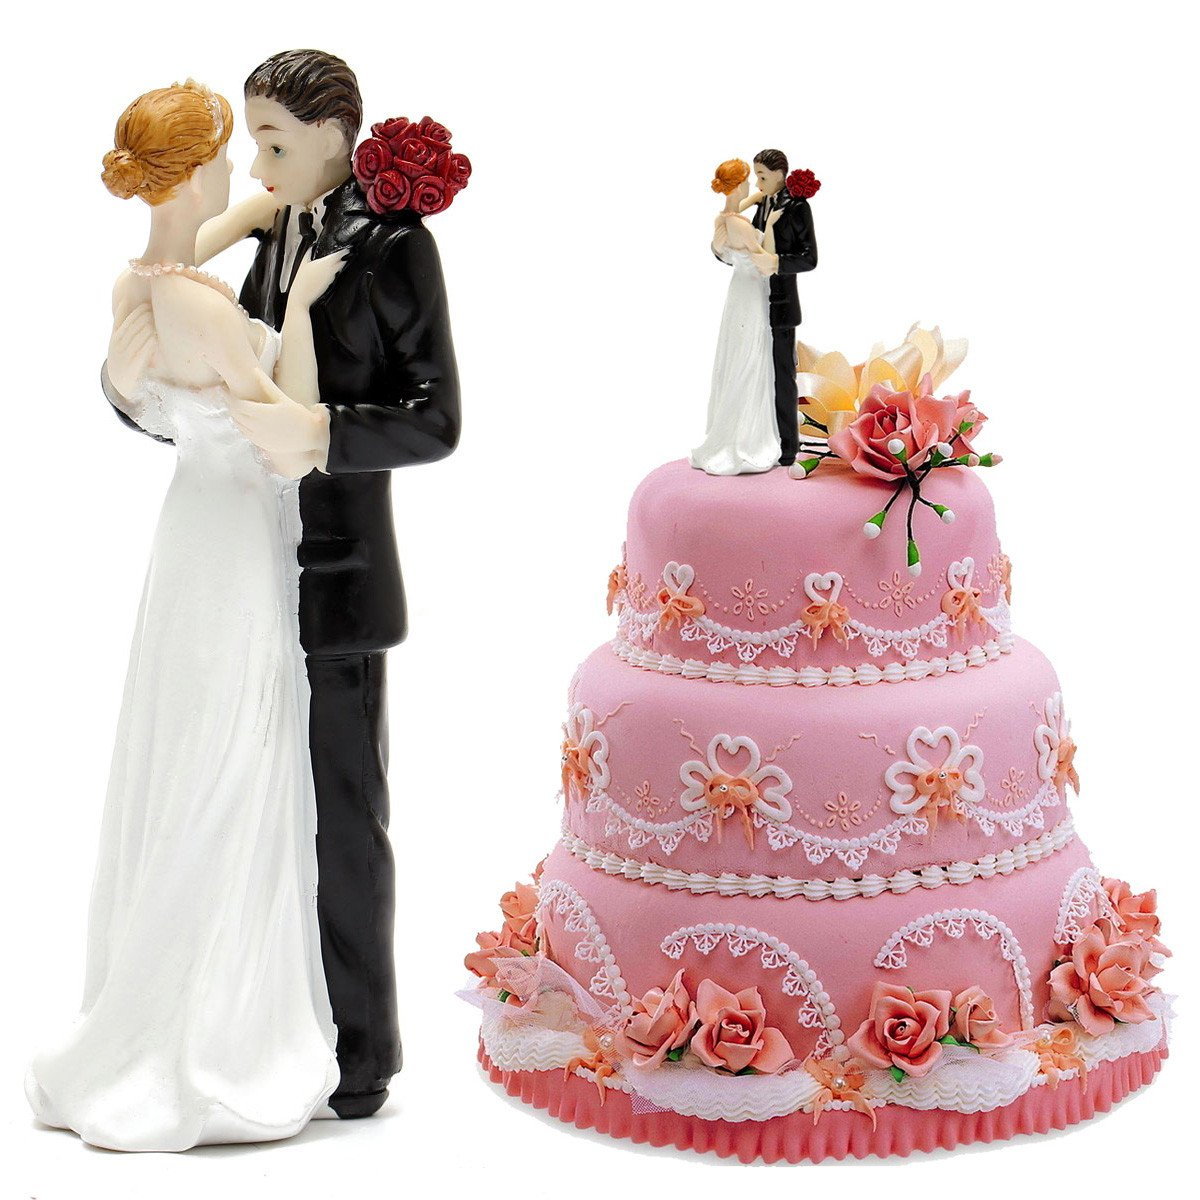 Amazon.com: Romantic bride and groom tender moment wedding couple ...